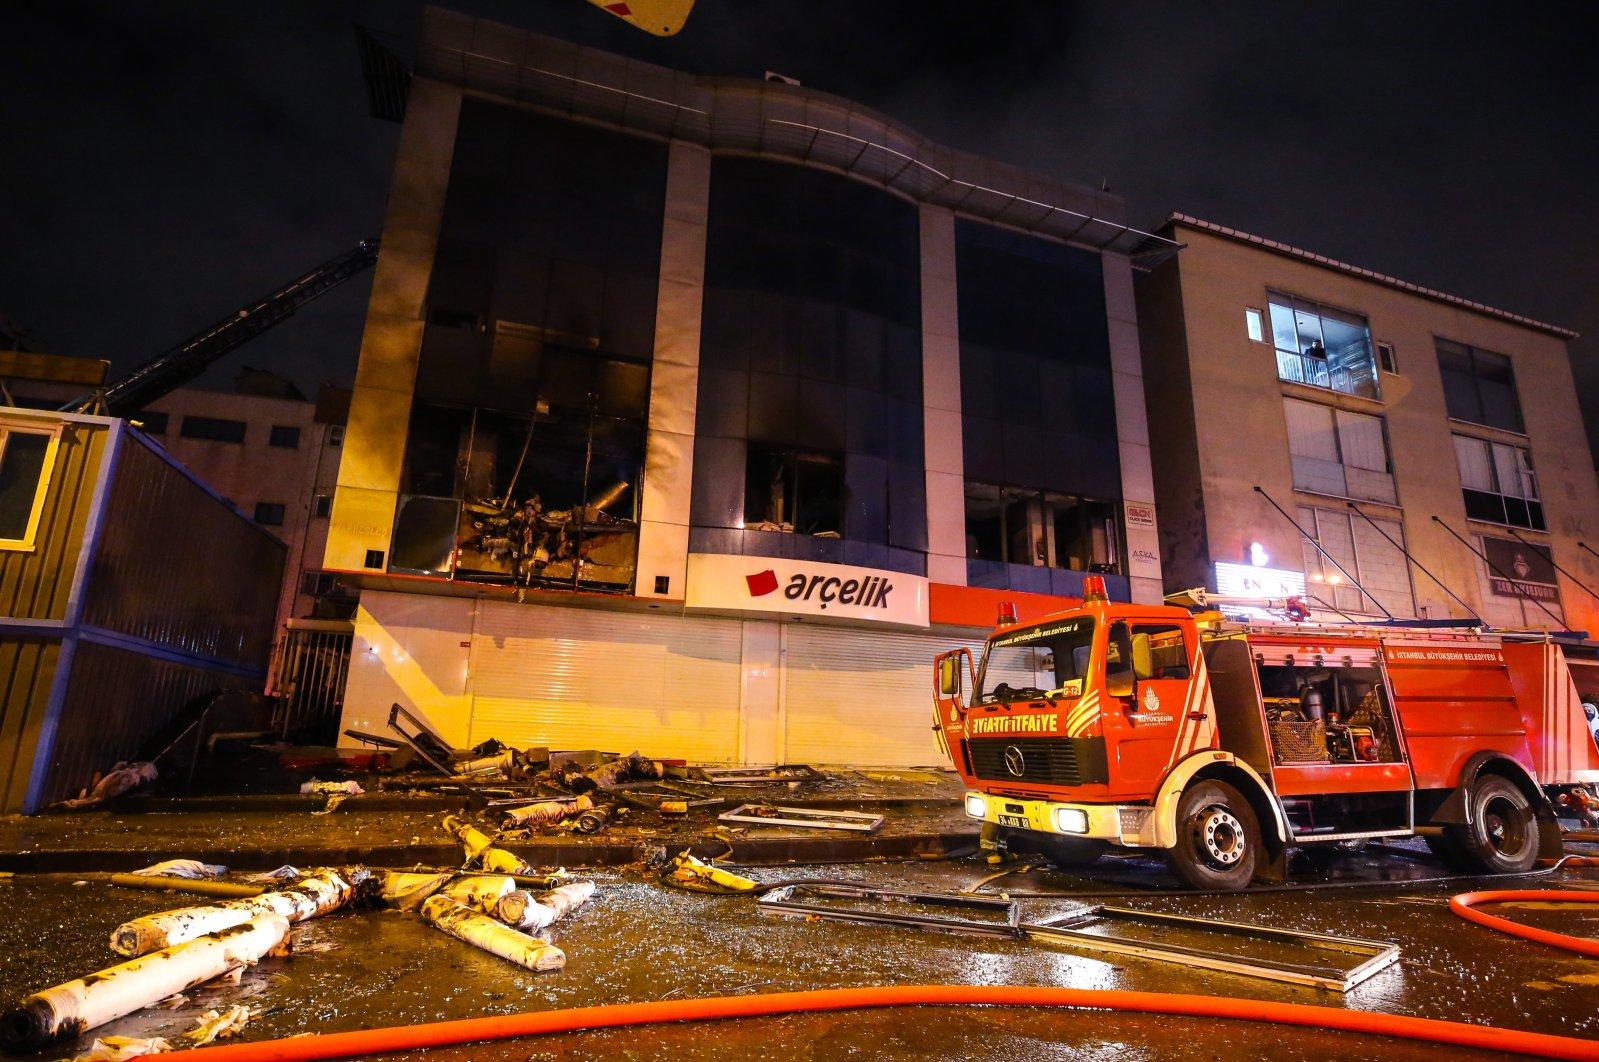 A fire truck outside a burned building in Bahçelievler district, in Istanbul, Turkey, Nov. 19, 2020. (AA Photo)